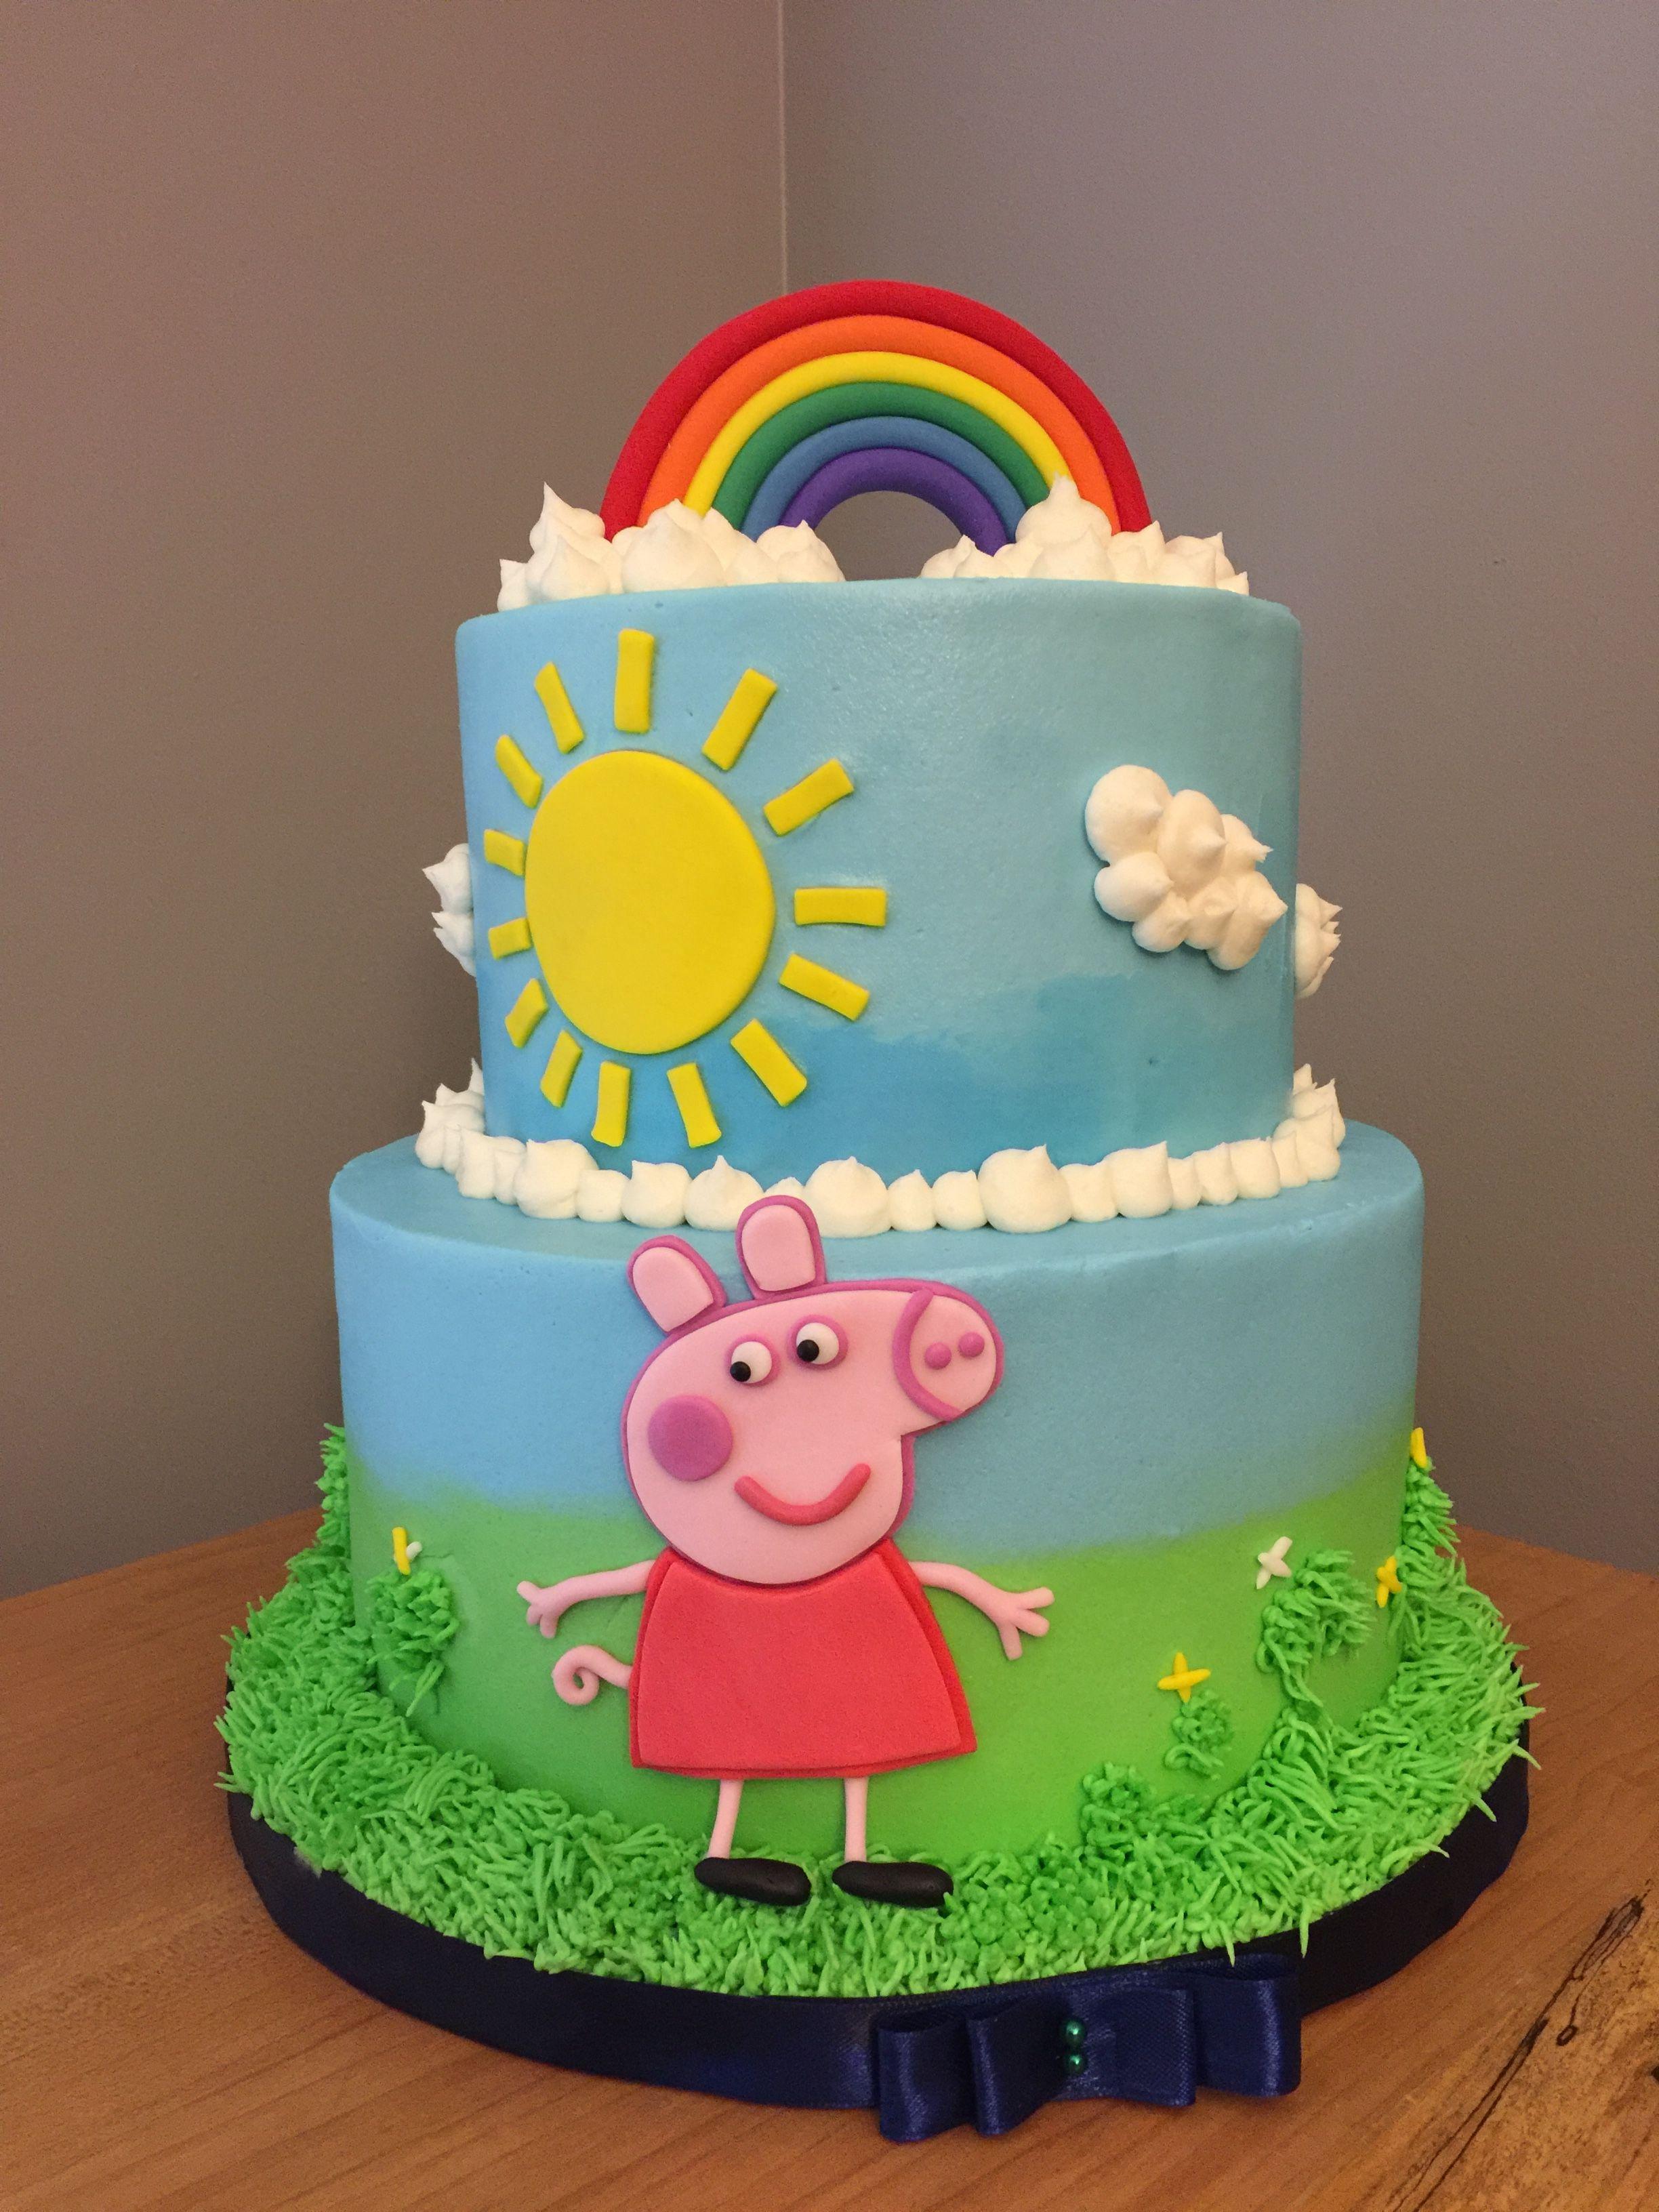 Enjoyable Peppa Pig Buttercream Cake Pig Birthday Cakes Peppa Pig Funny Birthday Cards Online Fluifree Goldxyz